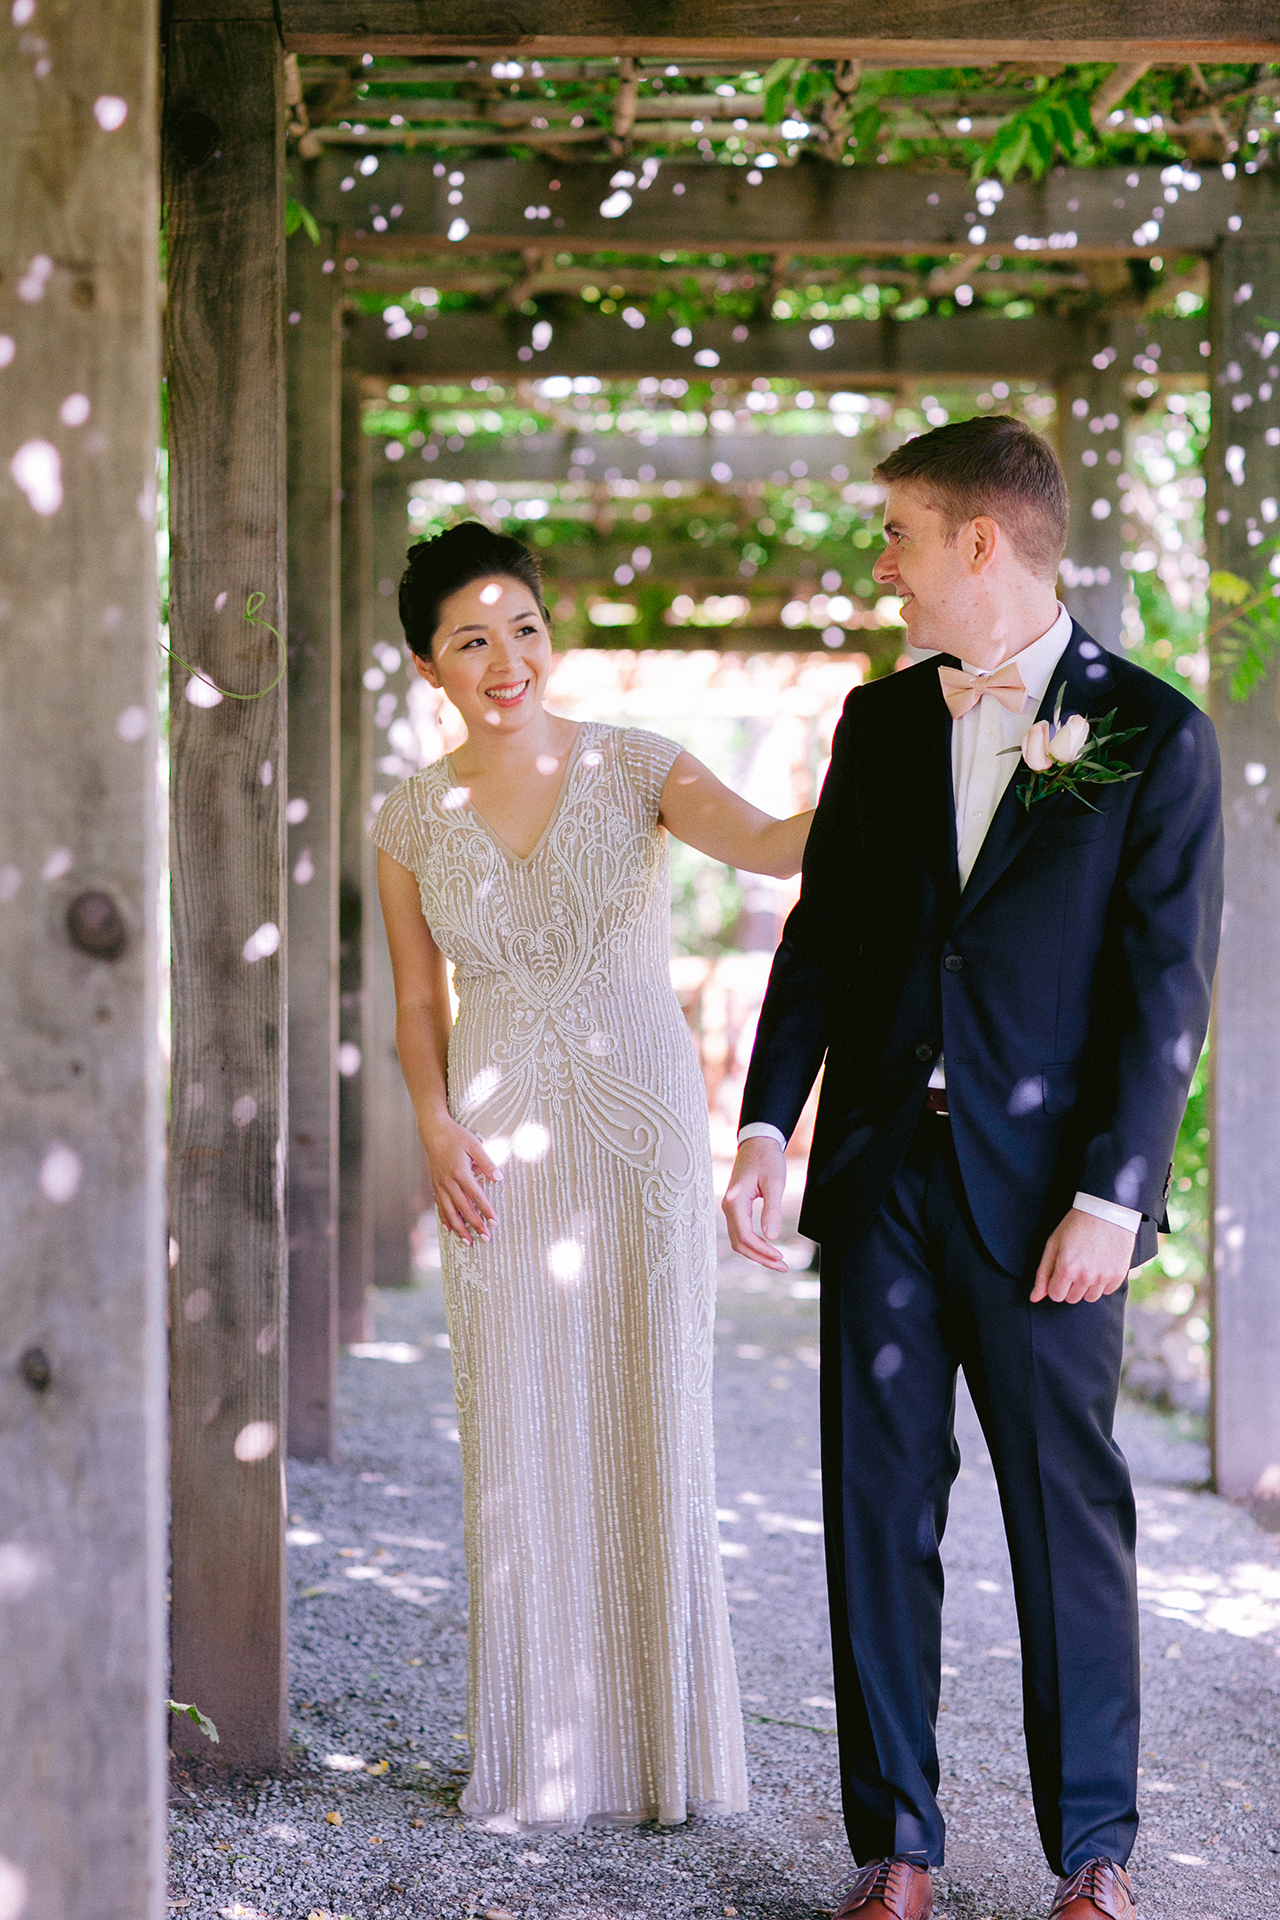 Hakone_Estate_and_Gardens_Wedding_004.jpg